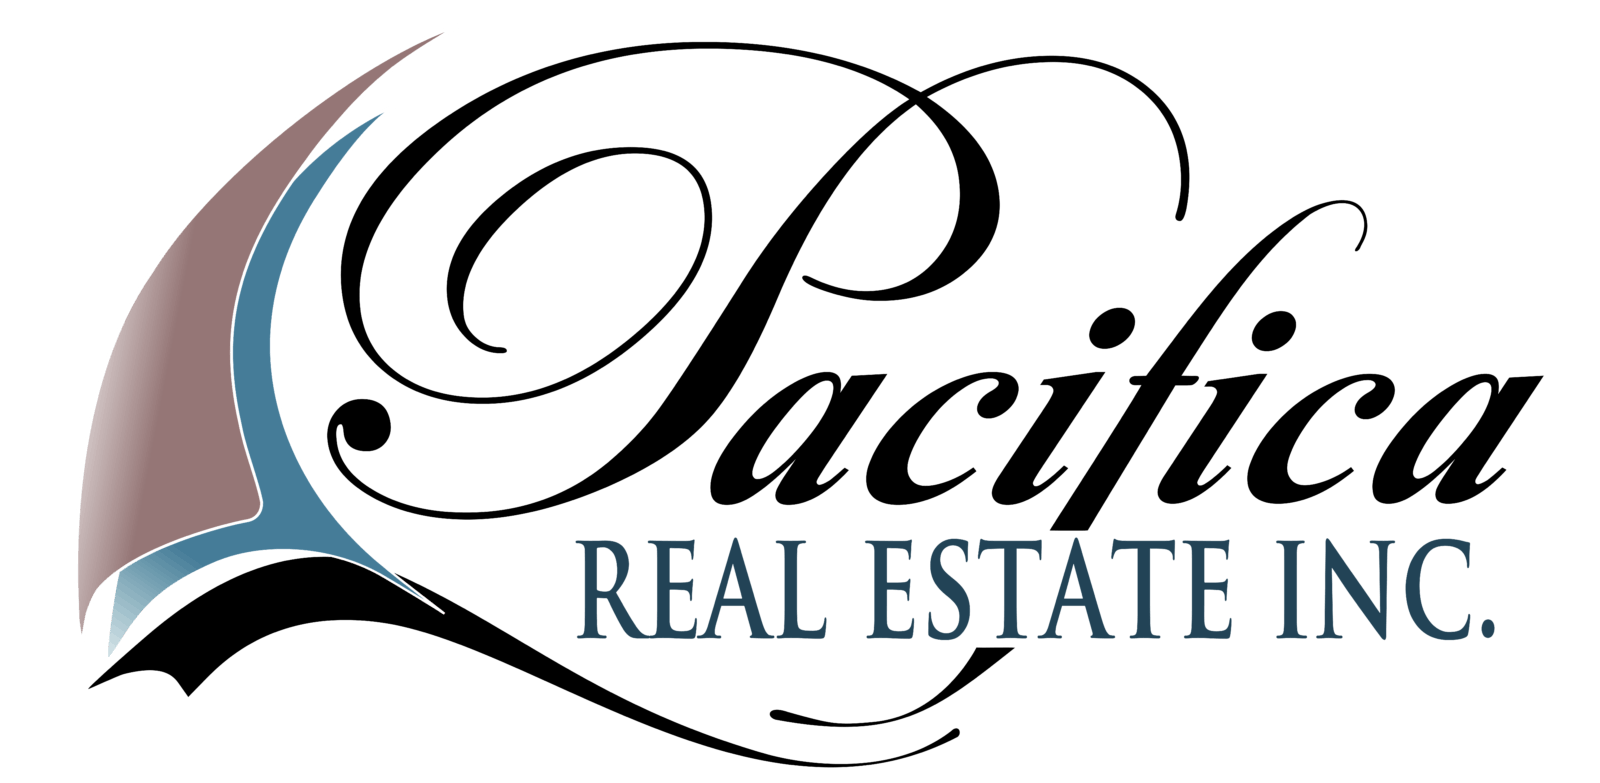 Pacifica Real Estate Inc.